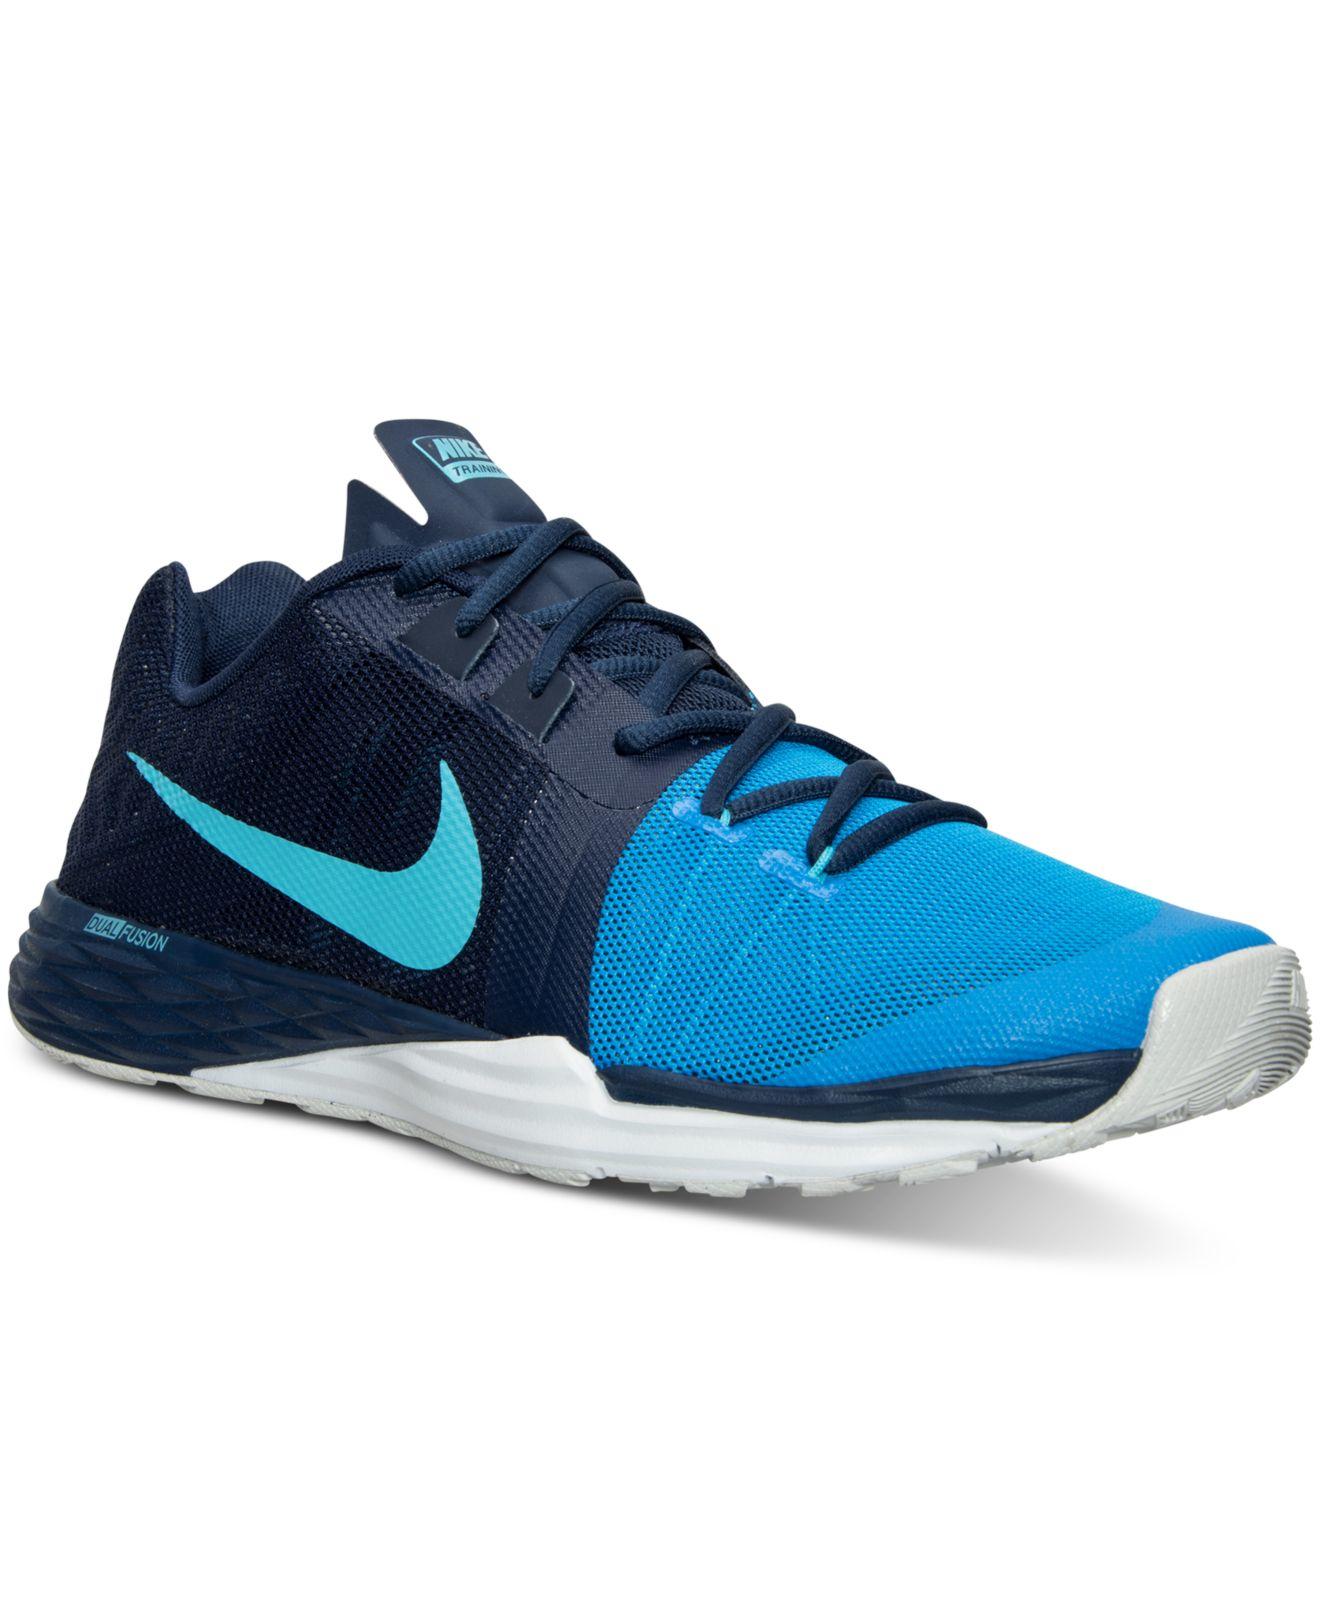 finish line athletic shoes macys basketball scores